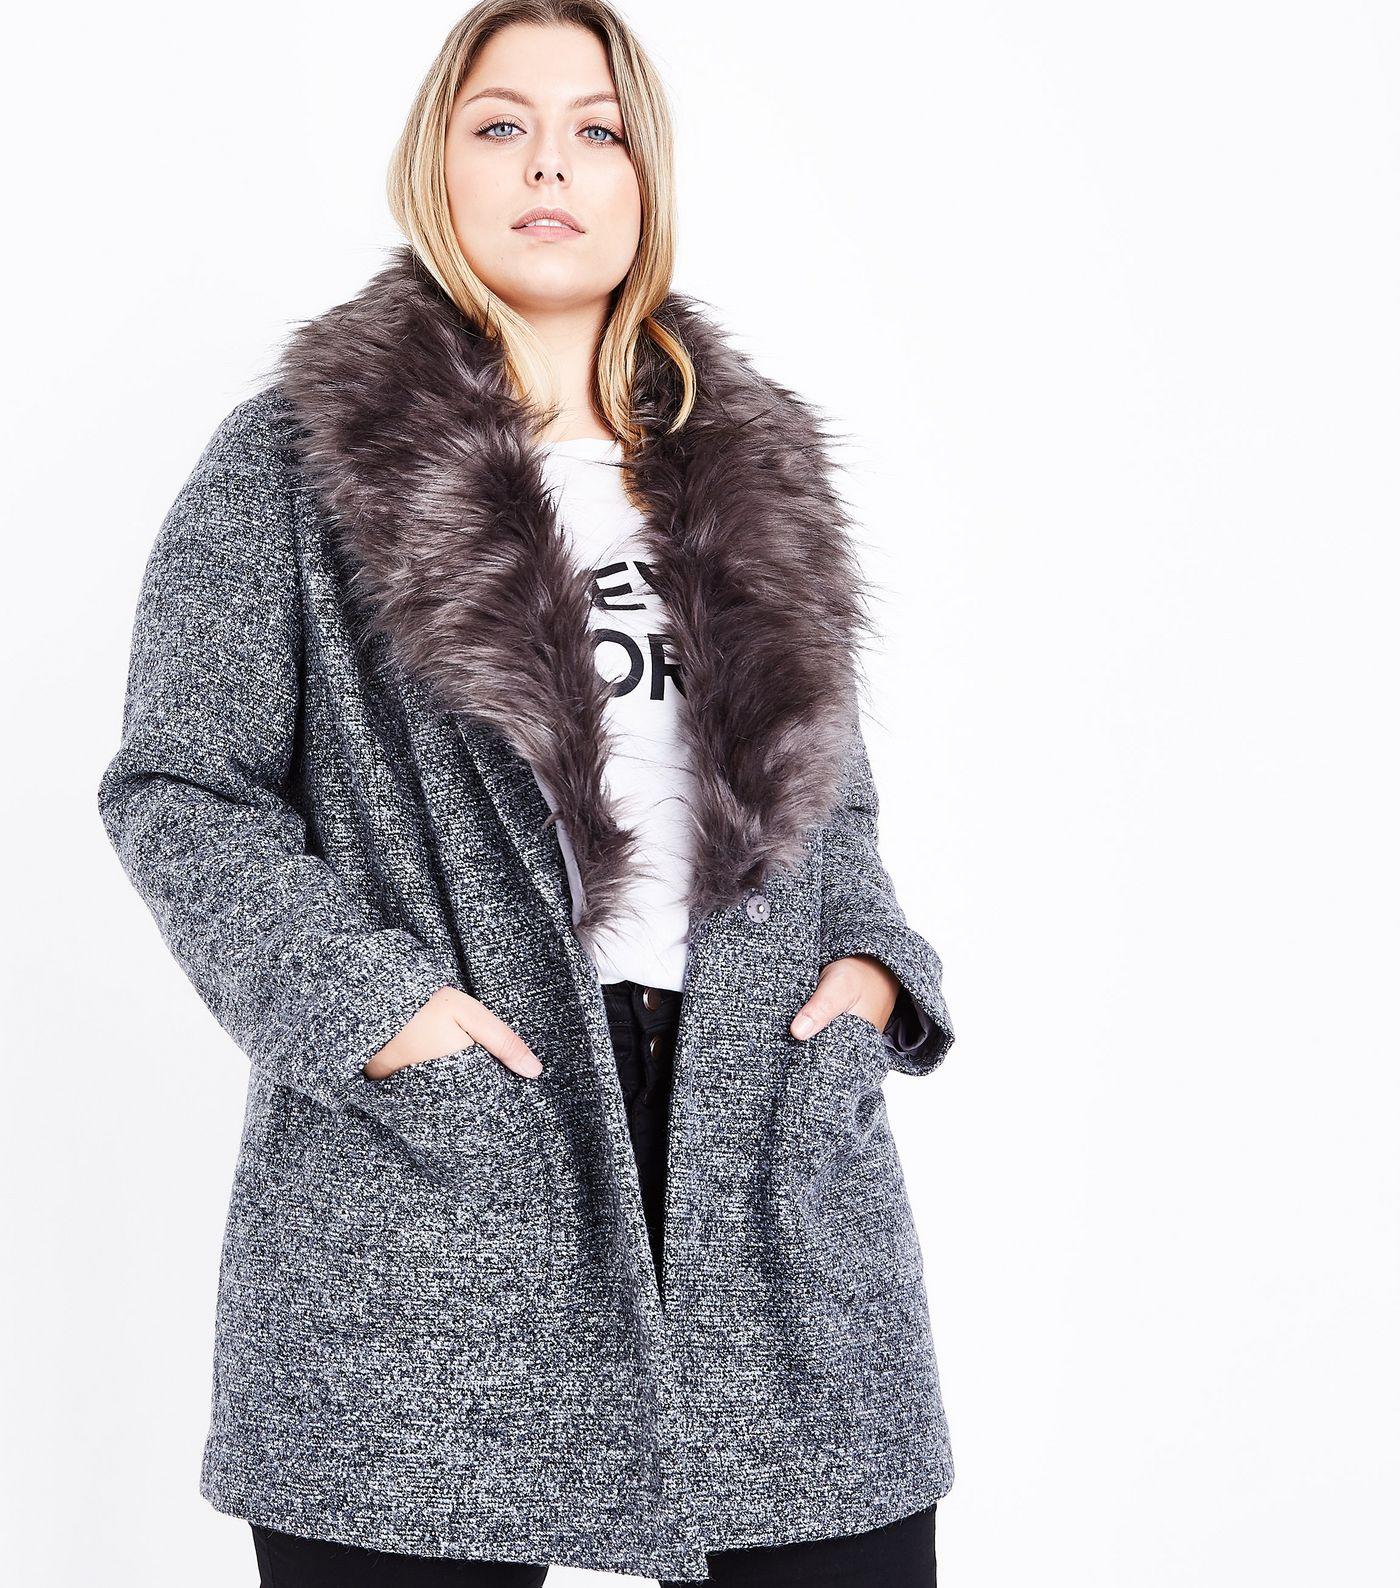 Curves Black Speckled Faux Fur Collar Coat - $62.05